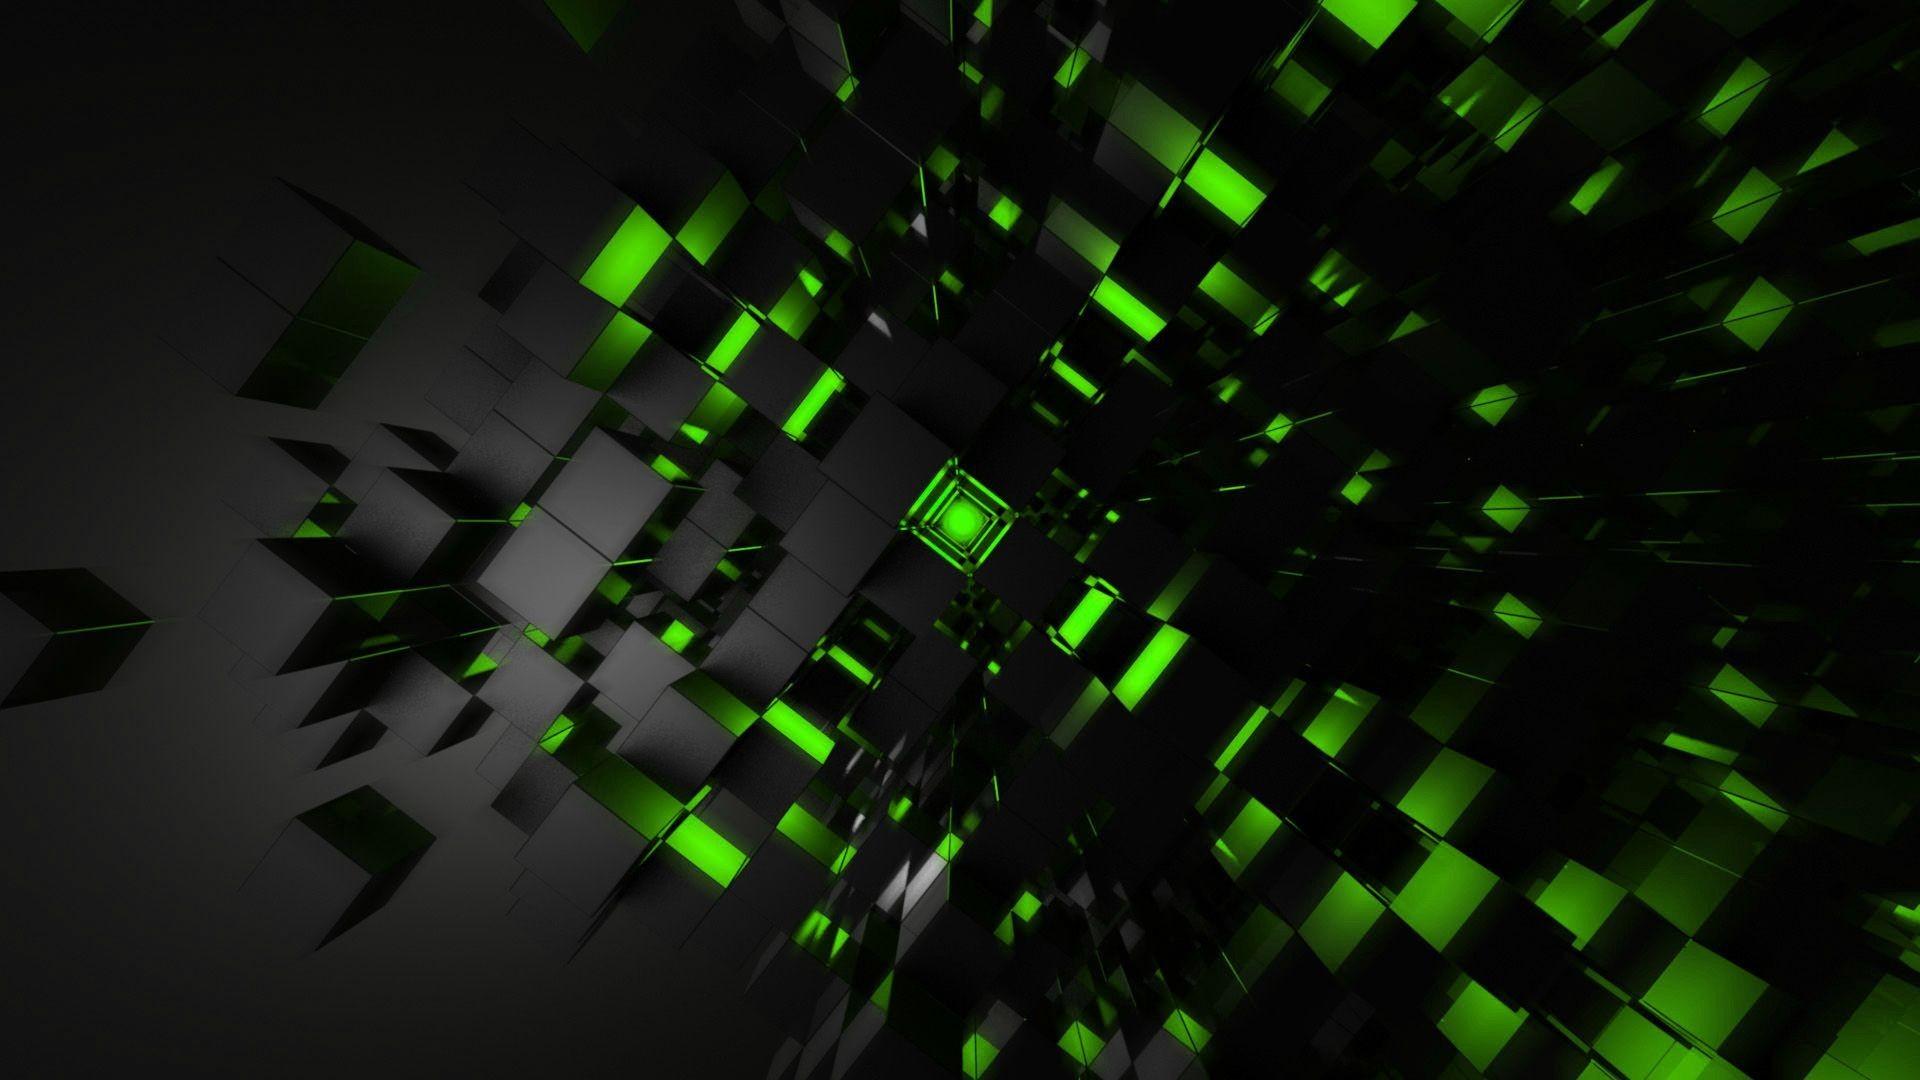 fav 0 rate 0 tweet 3d cube resolution date 14 01 .